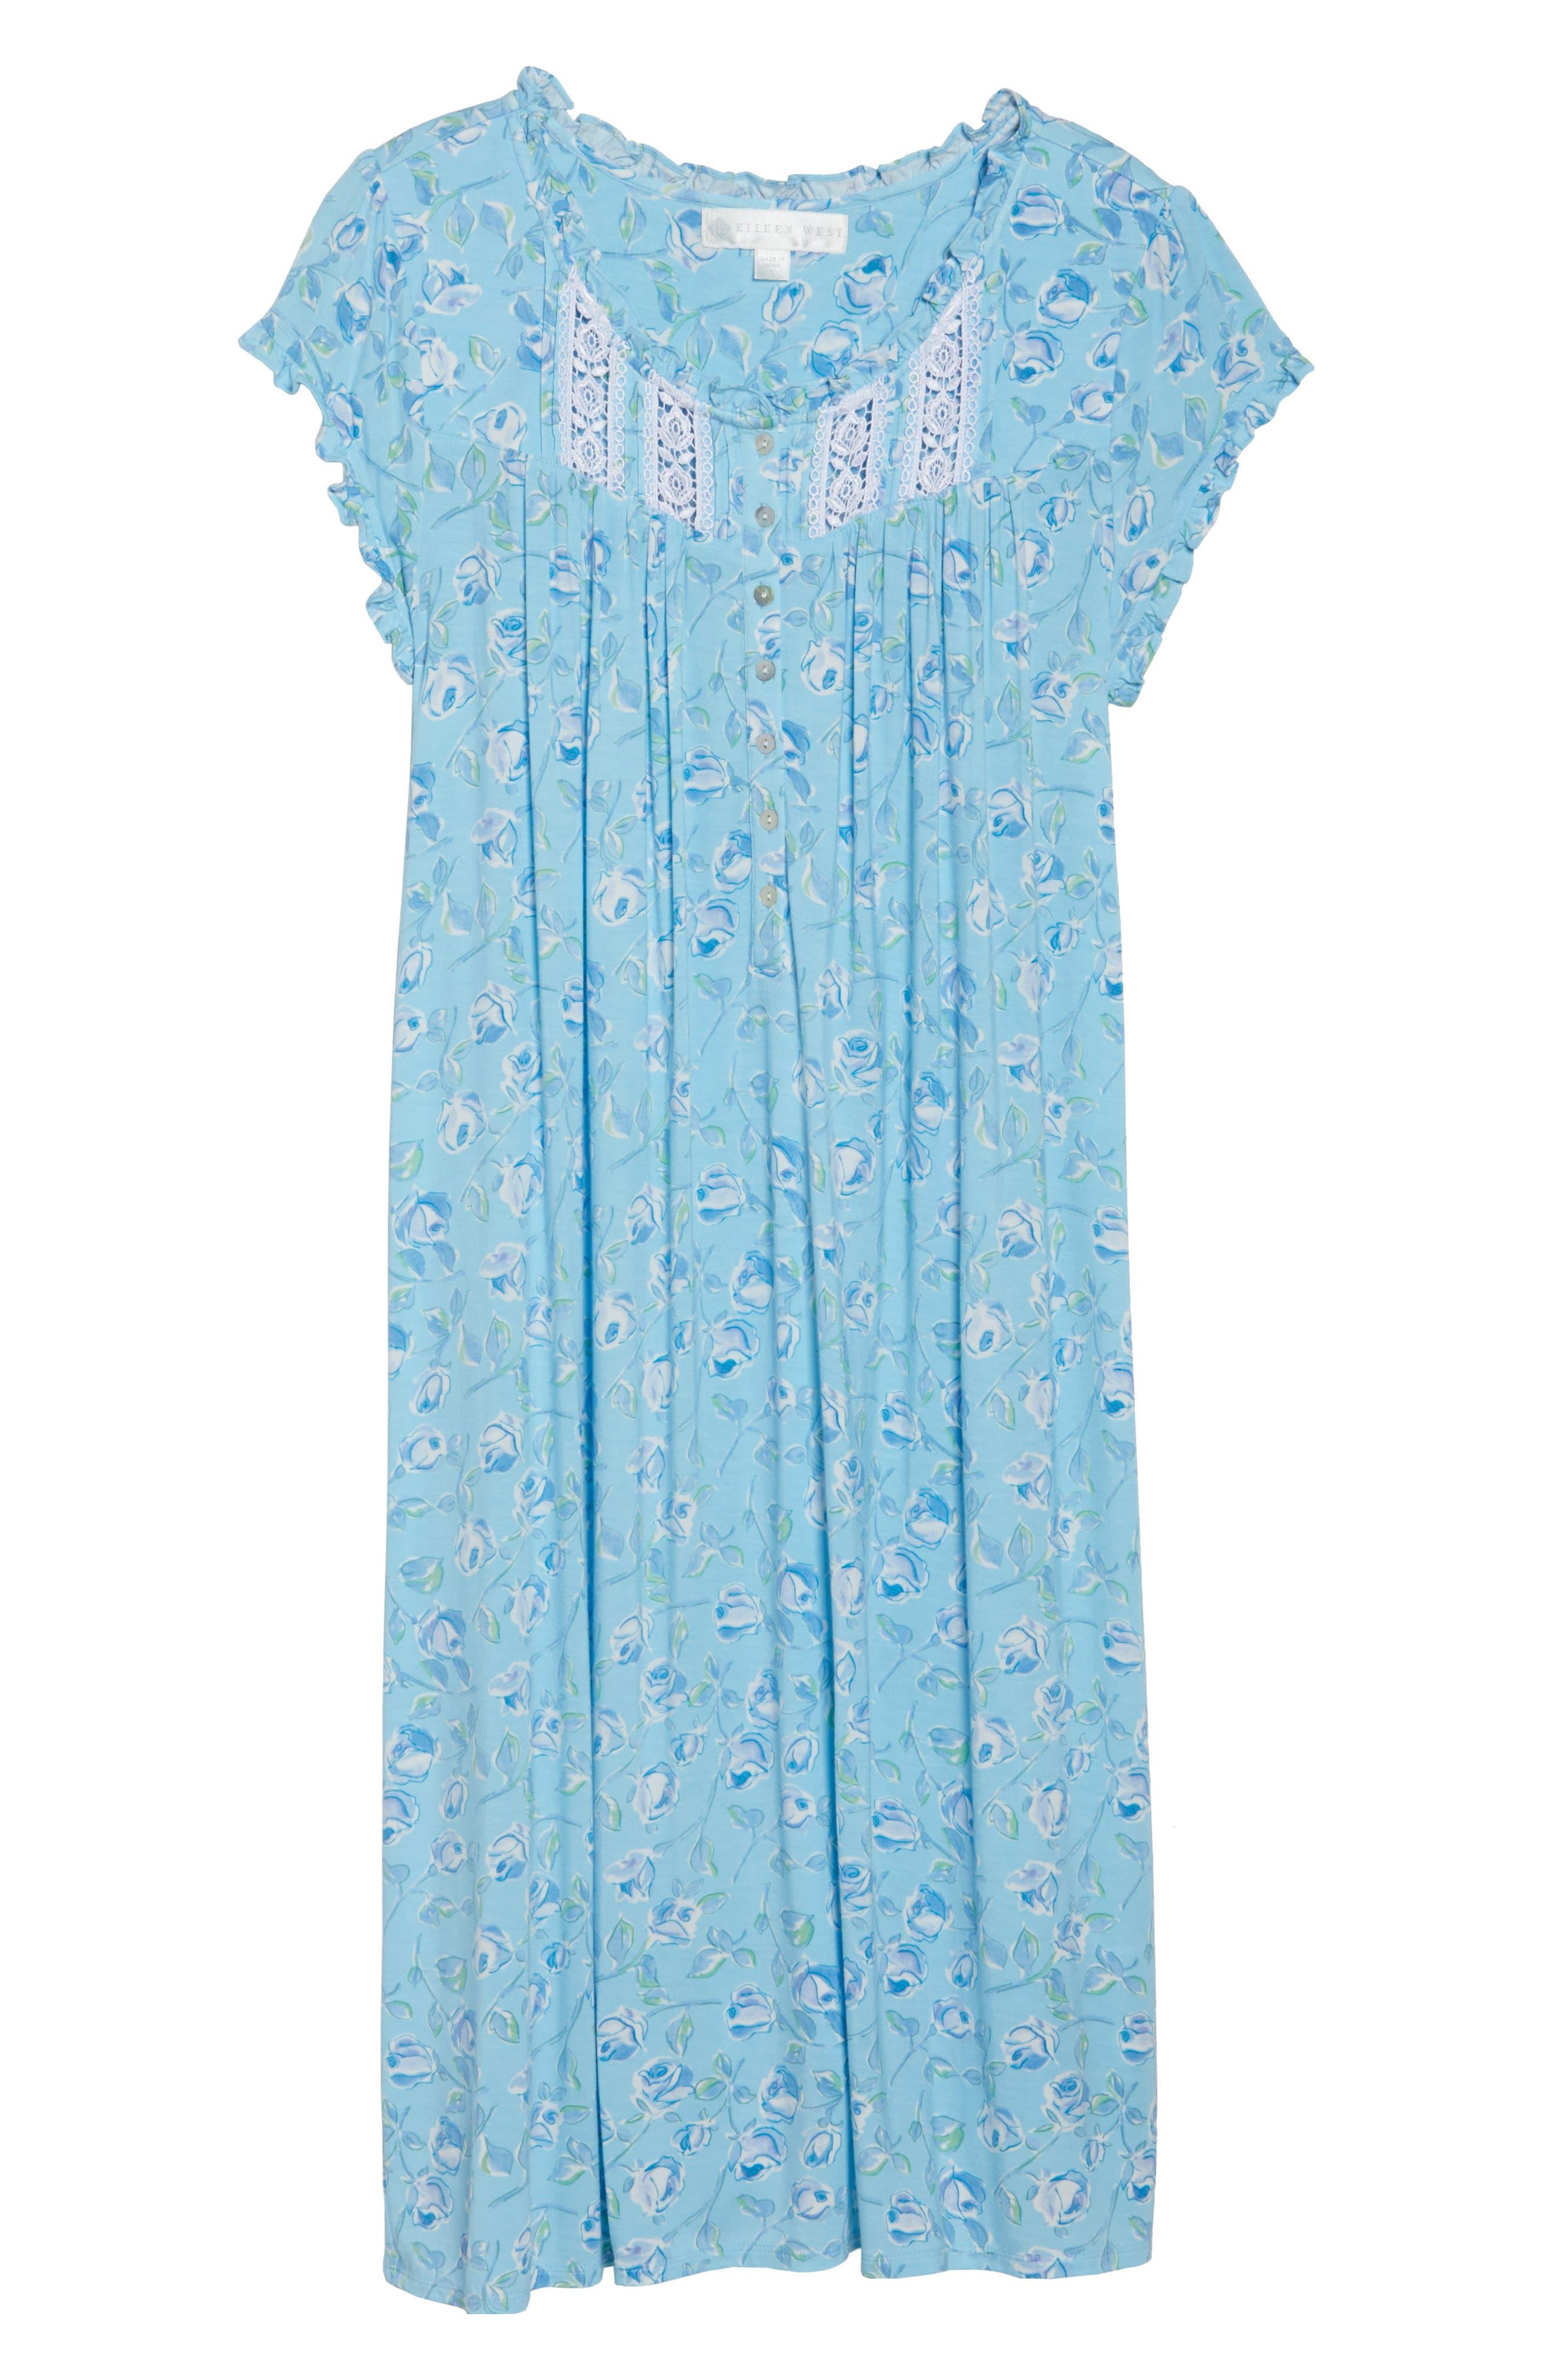 Waltz Nightgown,                             Alternate thumbnail 6, color,                             400